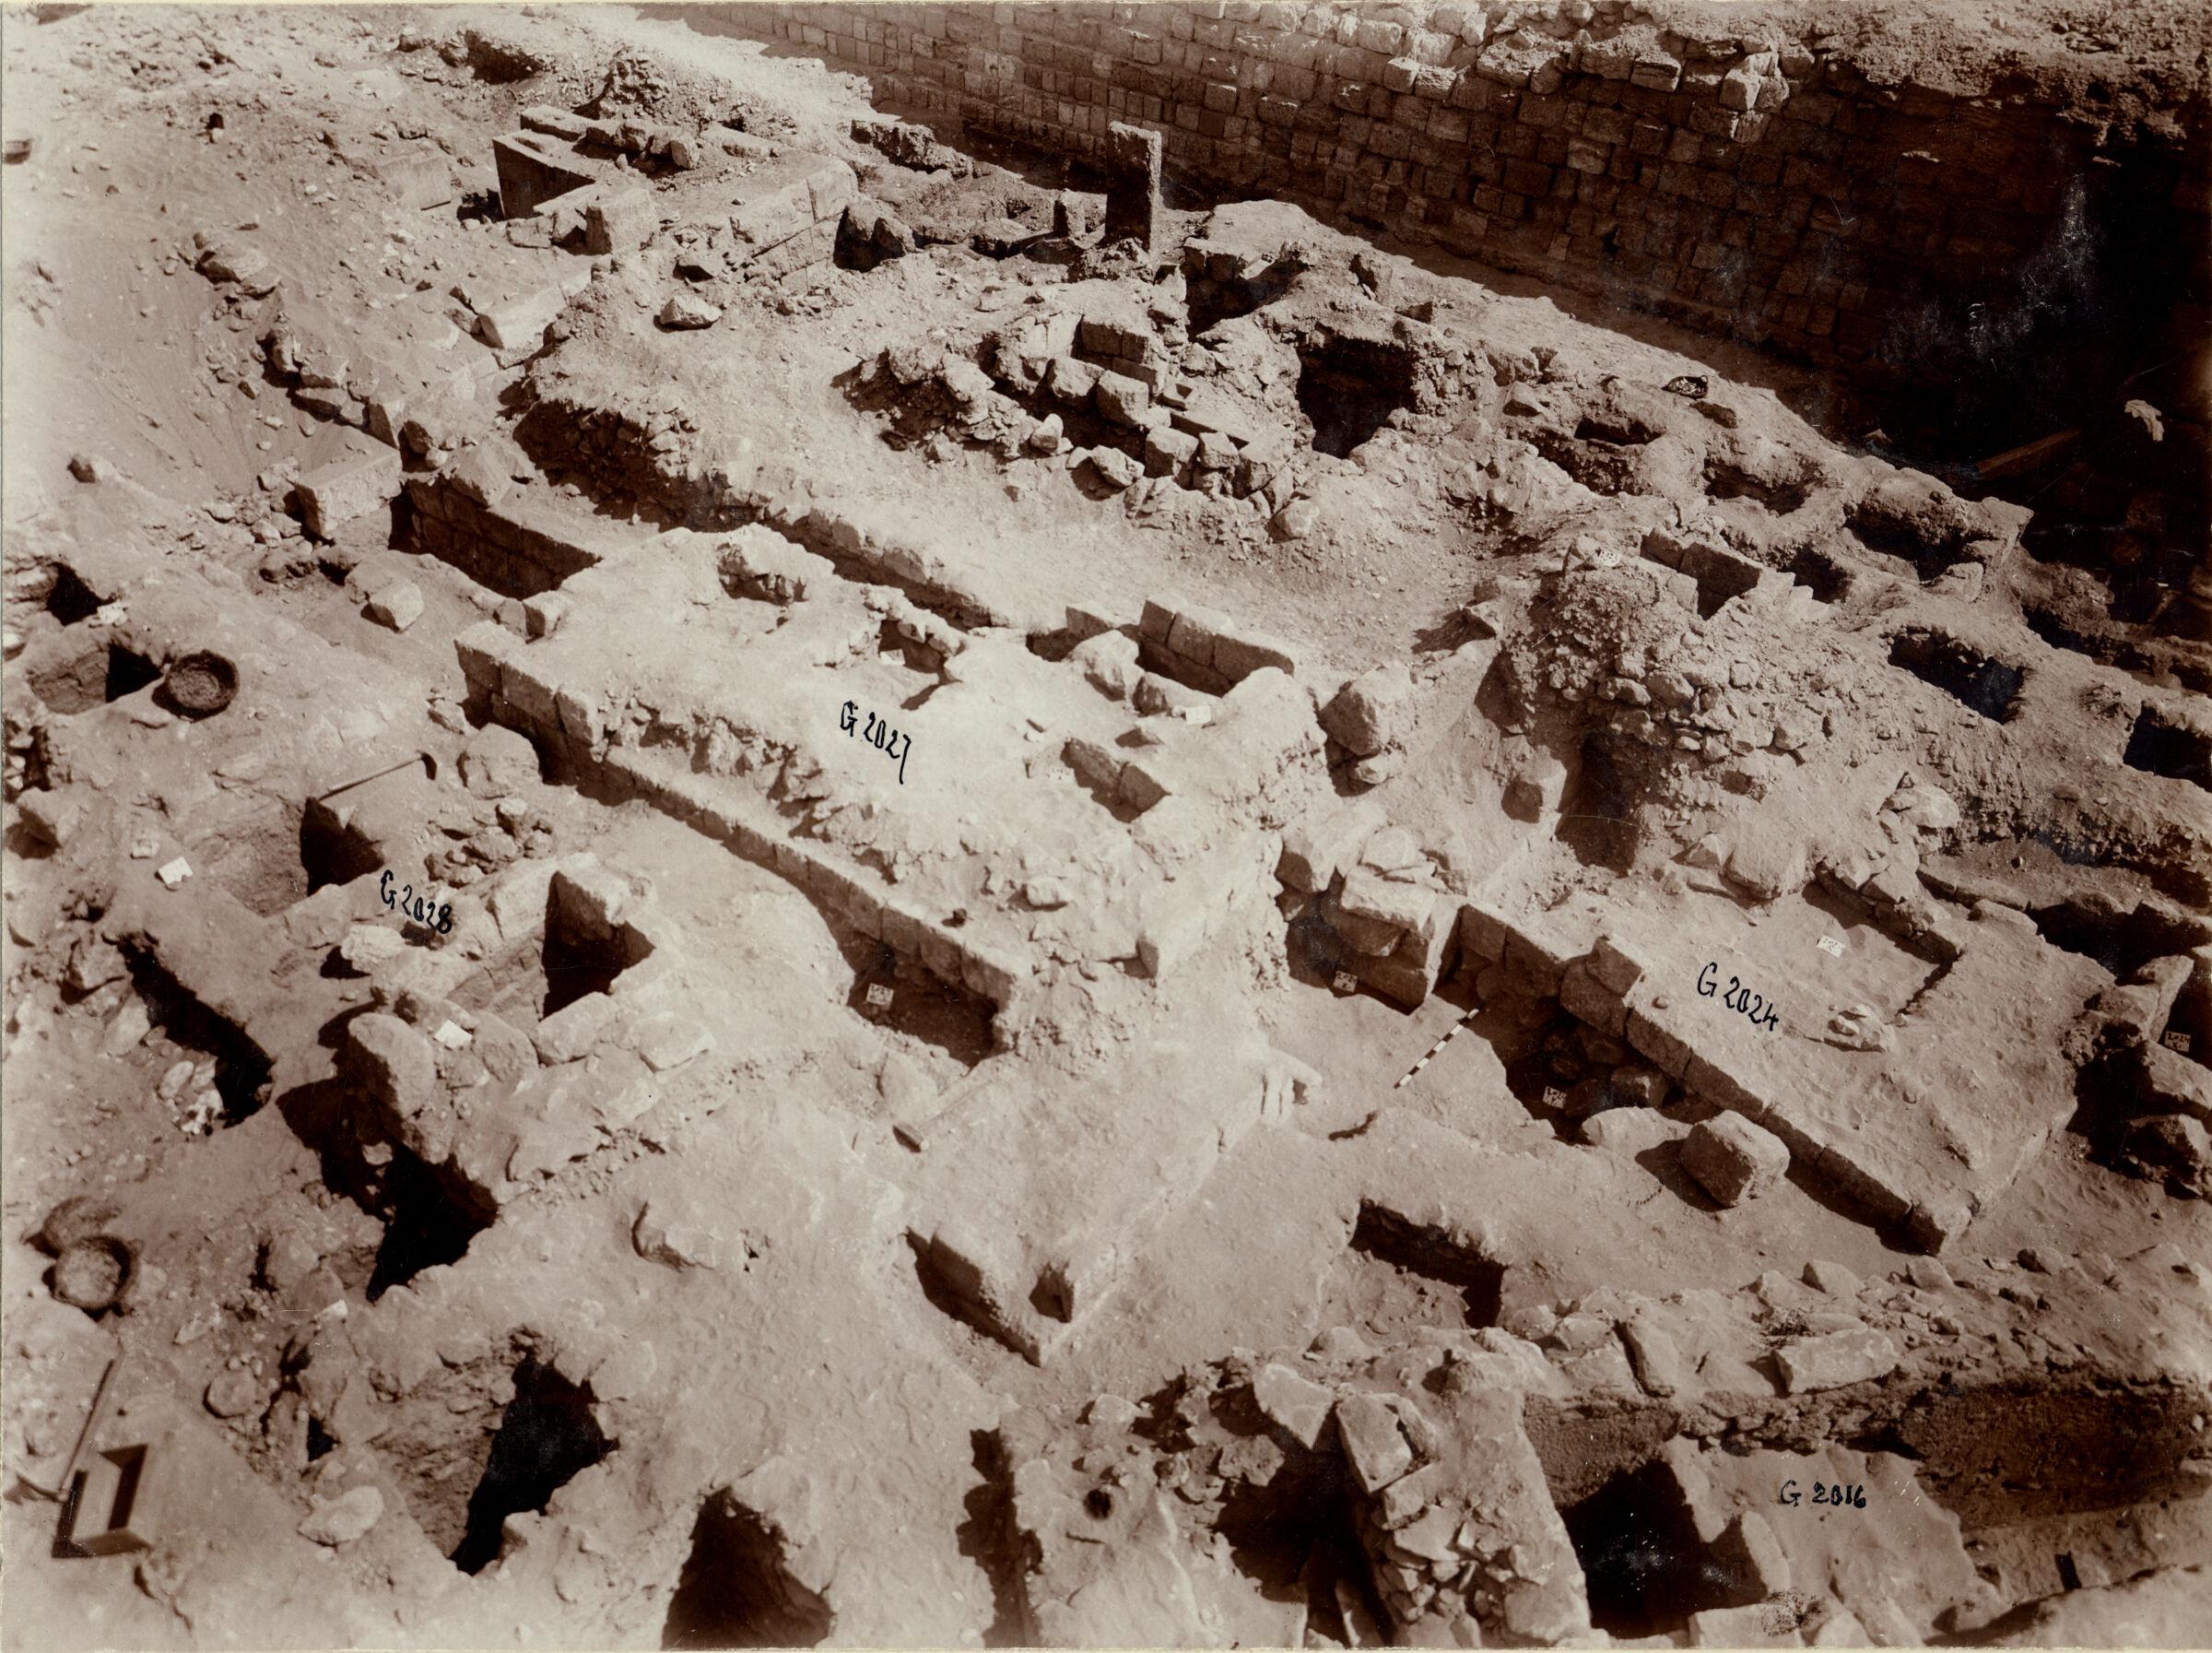 Western Cemetery: Site: Giza; View: G 2018a, G 2018b, G 2027, G 2024, G 2021, G 2023, G 2022, G 2016